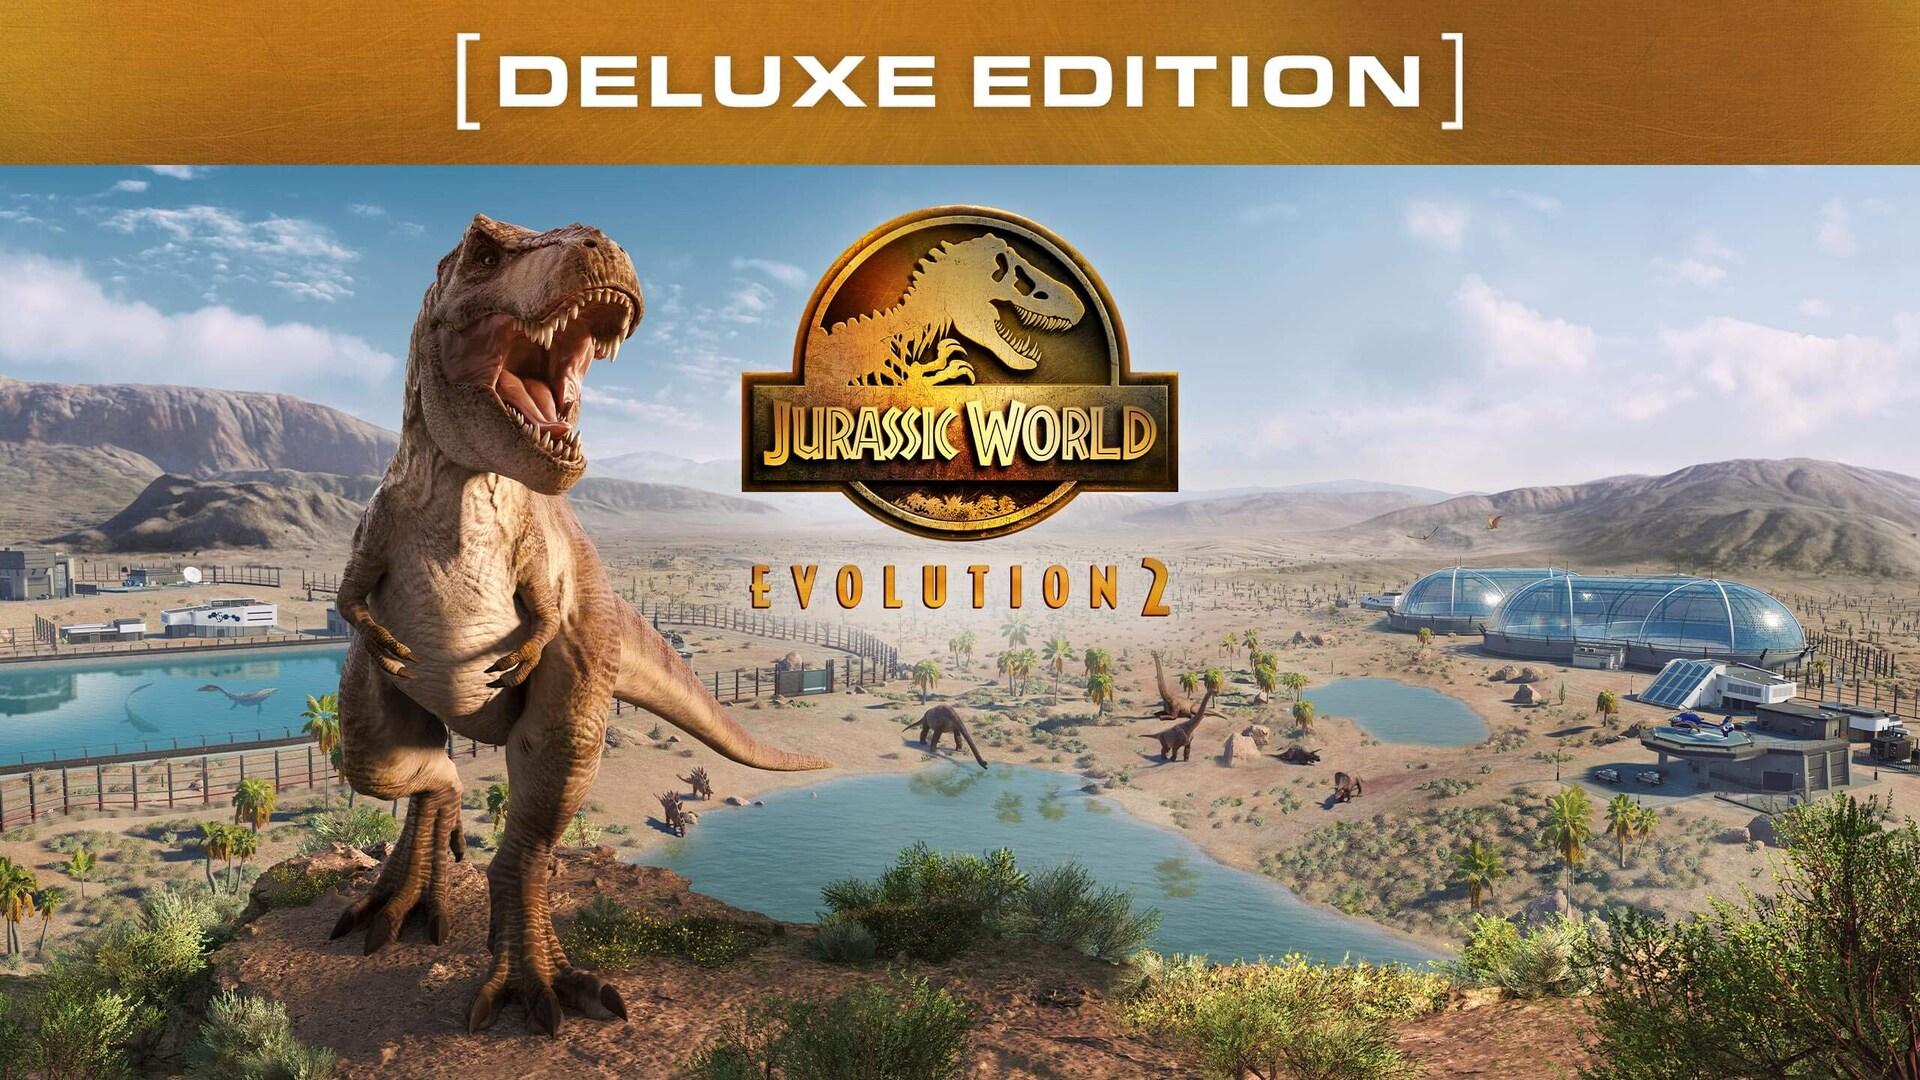 Pre-purchase Jurassic World Evolution 2 on Epic Games Store